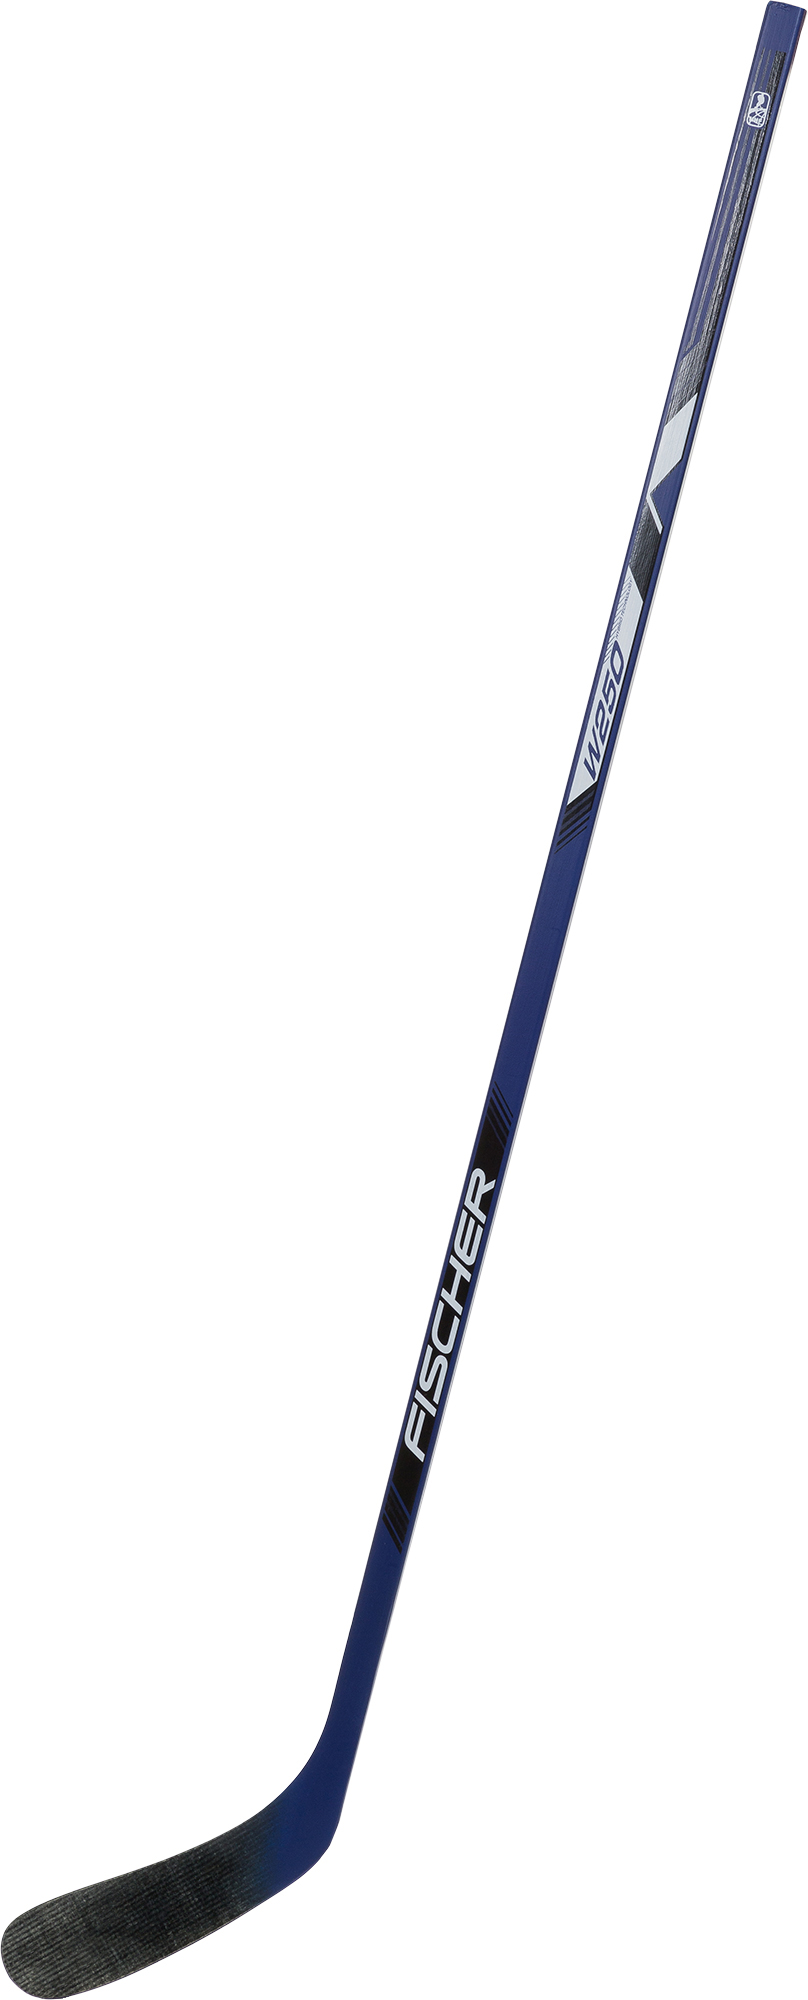 Fischer Клюшка хоккейная Fischer W250 ABS SR, размер R цена